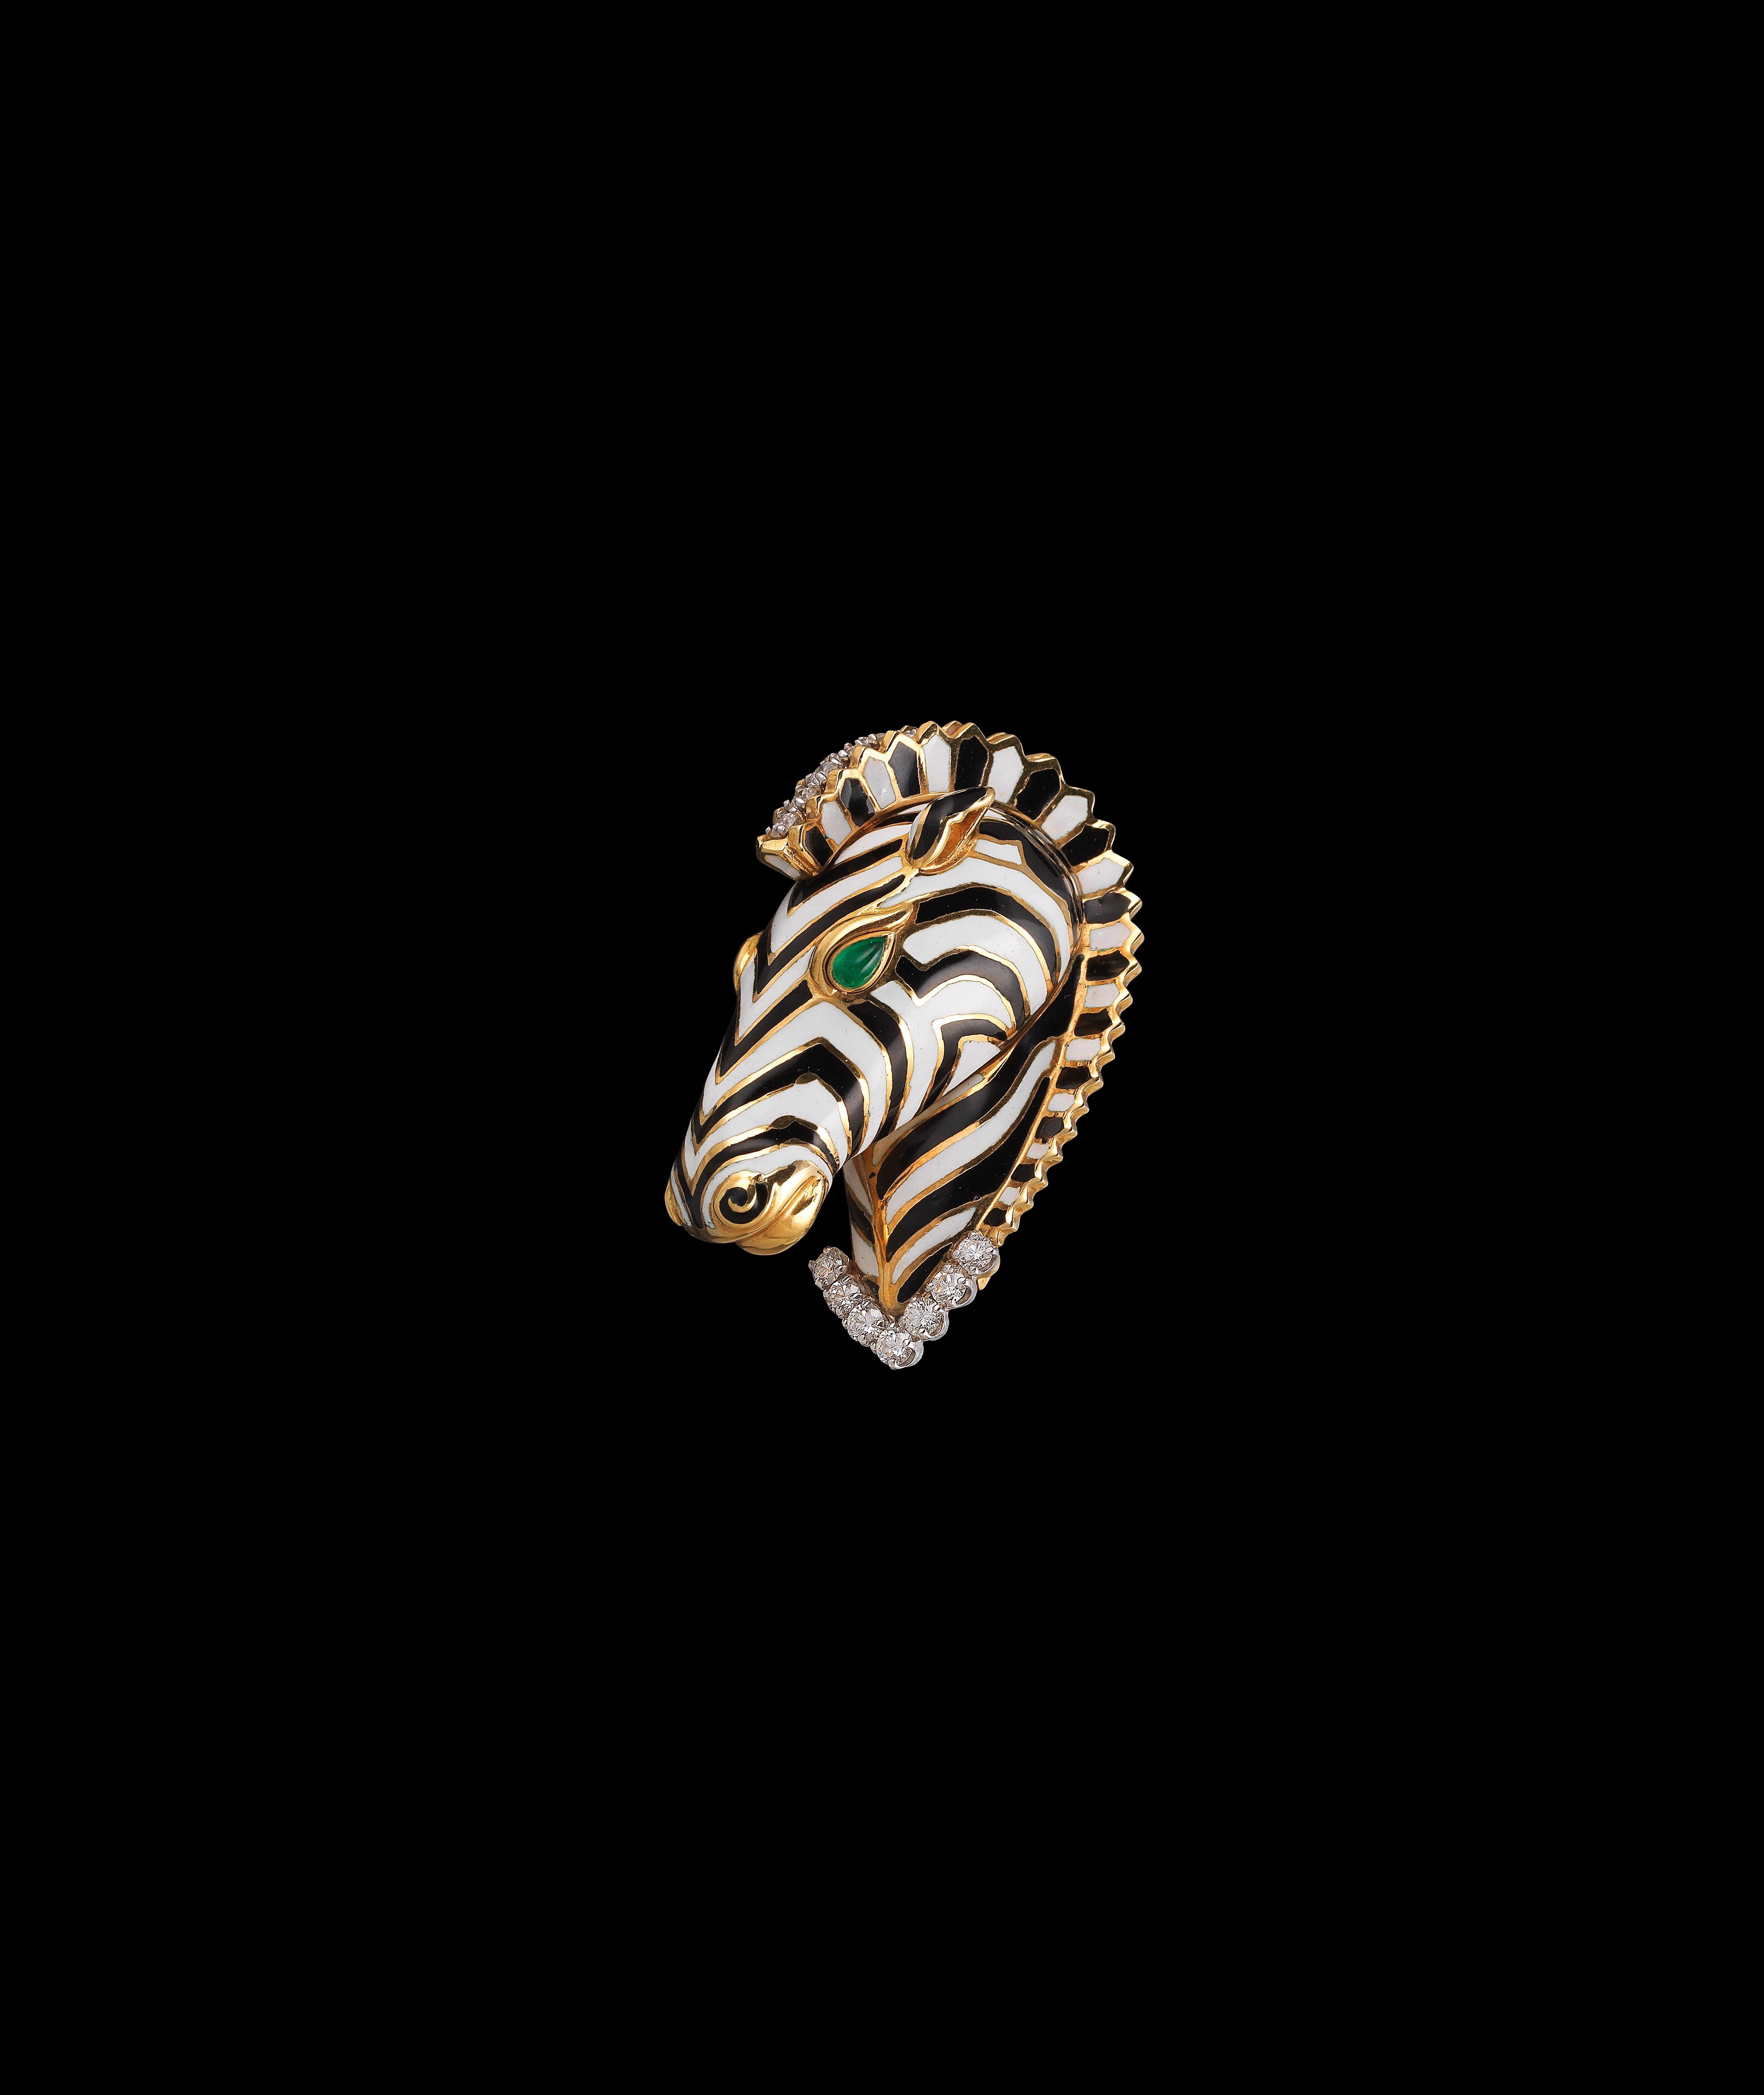 A Kingdom Zebra Brooch by David Webb, gold 750, brilliants total weight c. 1 ct, emerald cabochons, c. 1970 € 7,000 - 10,000